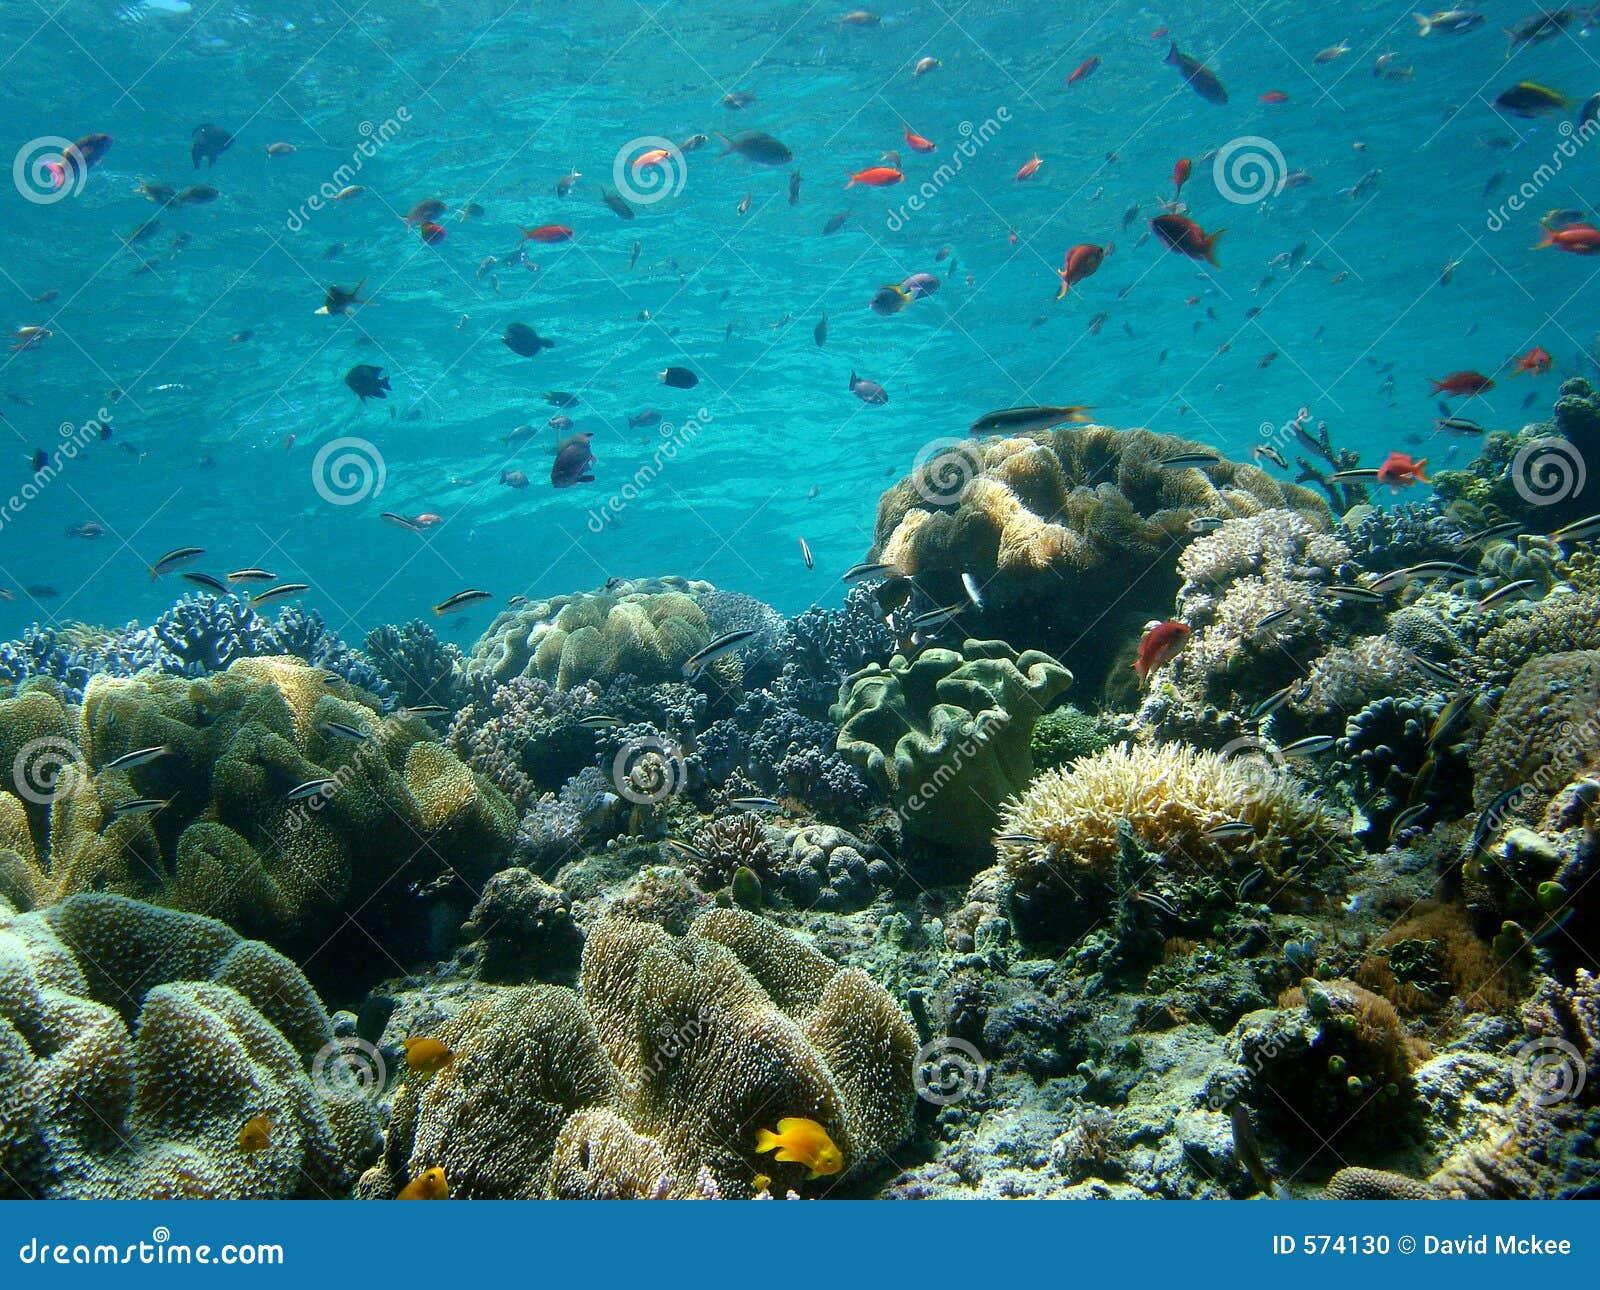 Blaues Wasser, Korallenriff